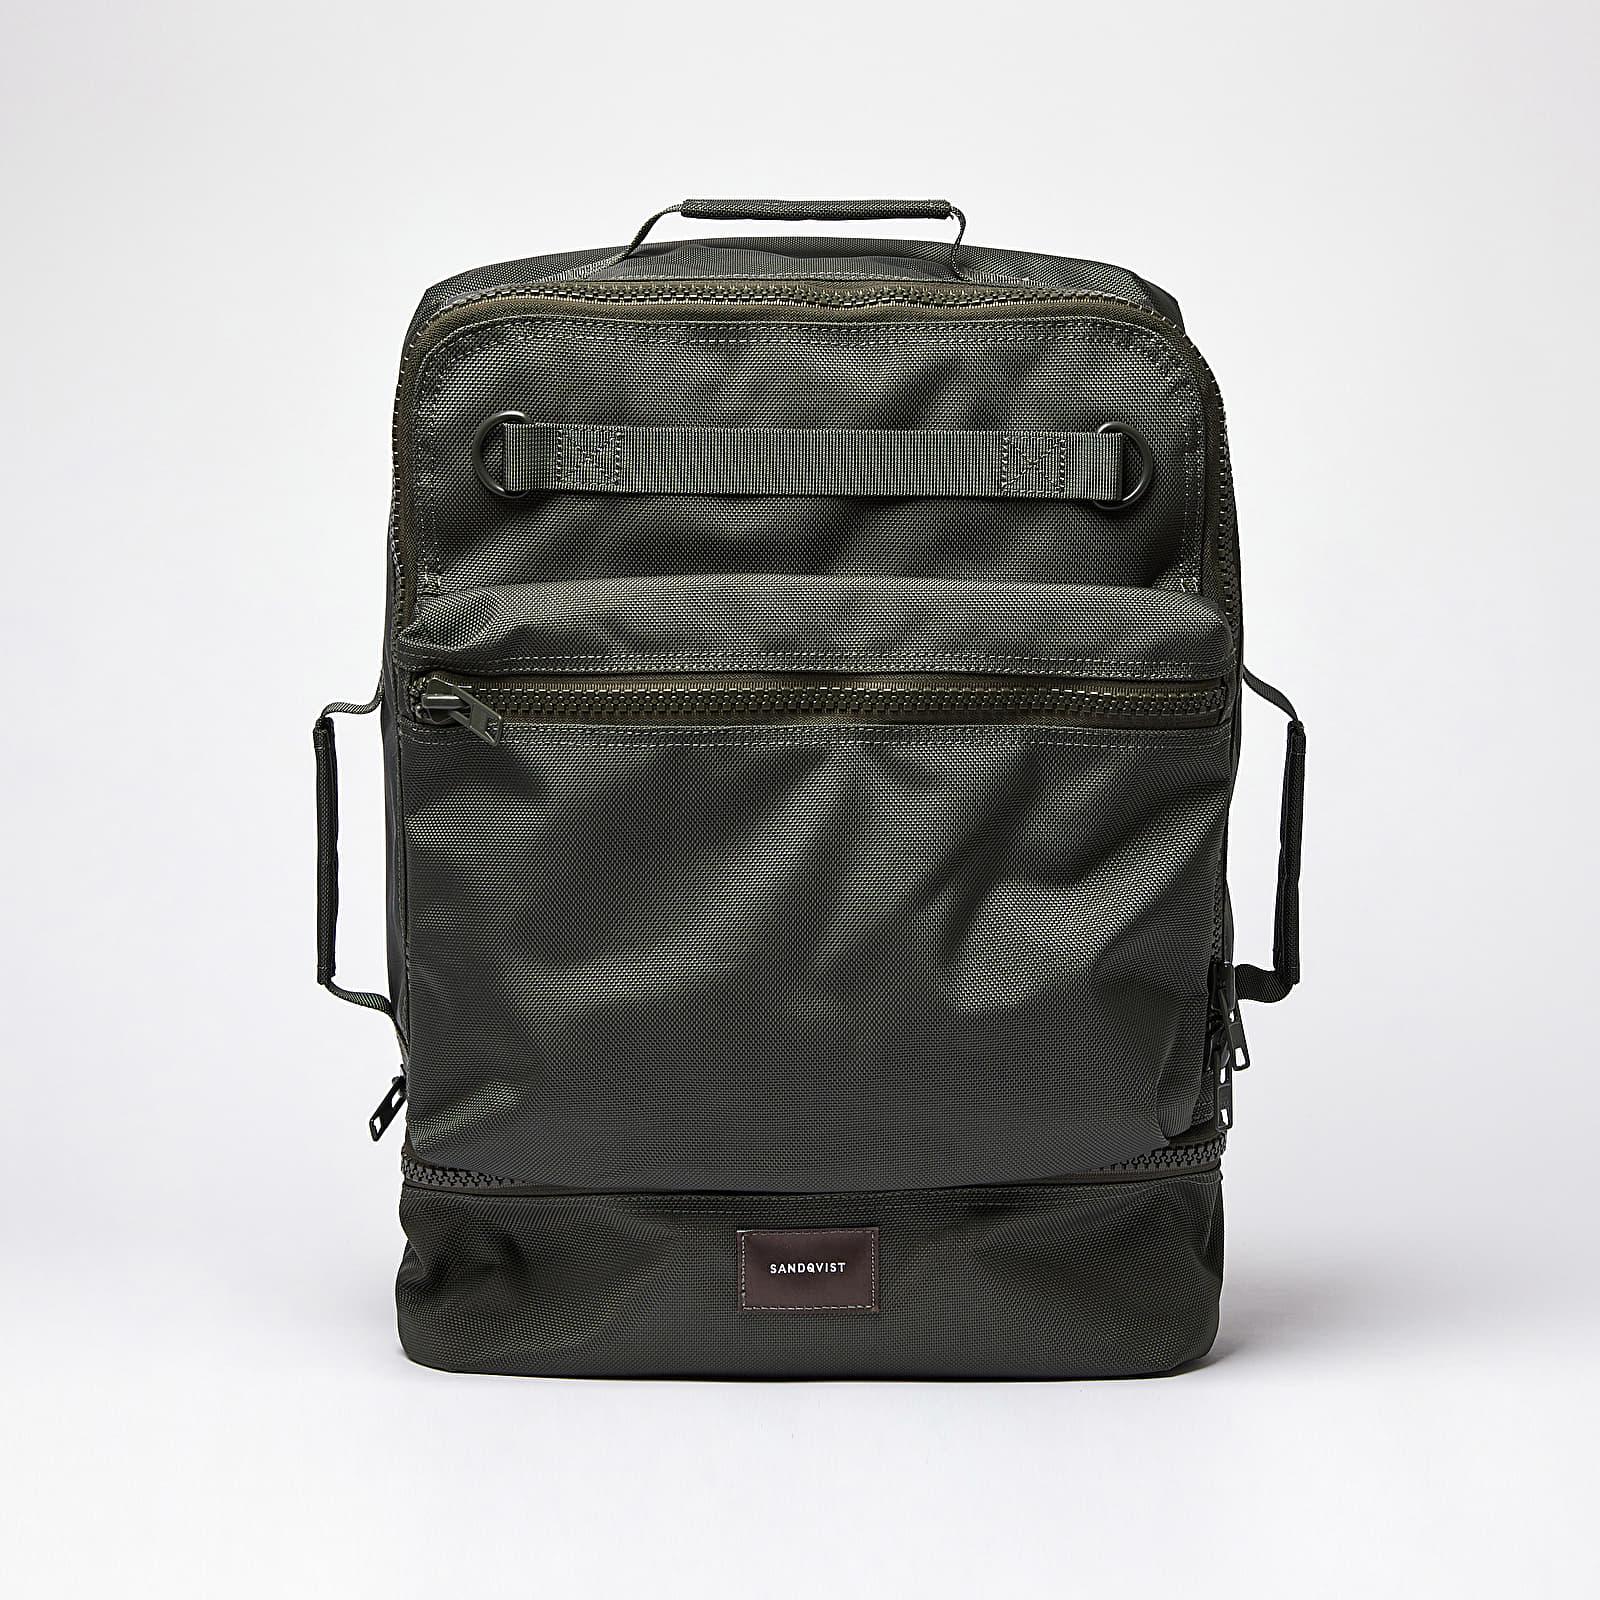 Backpacks Sandqvist Algot Backpack Beluga